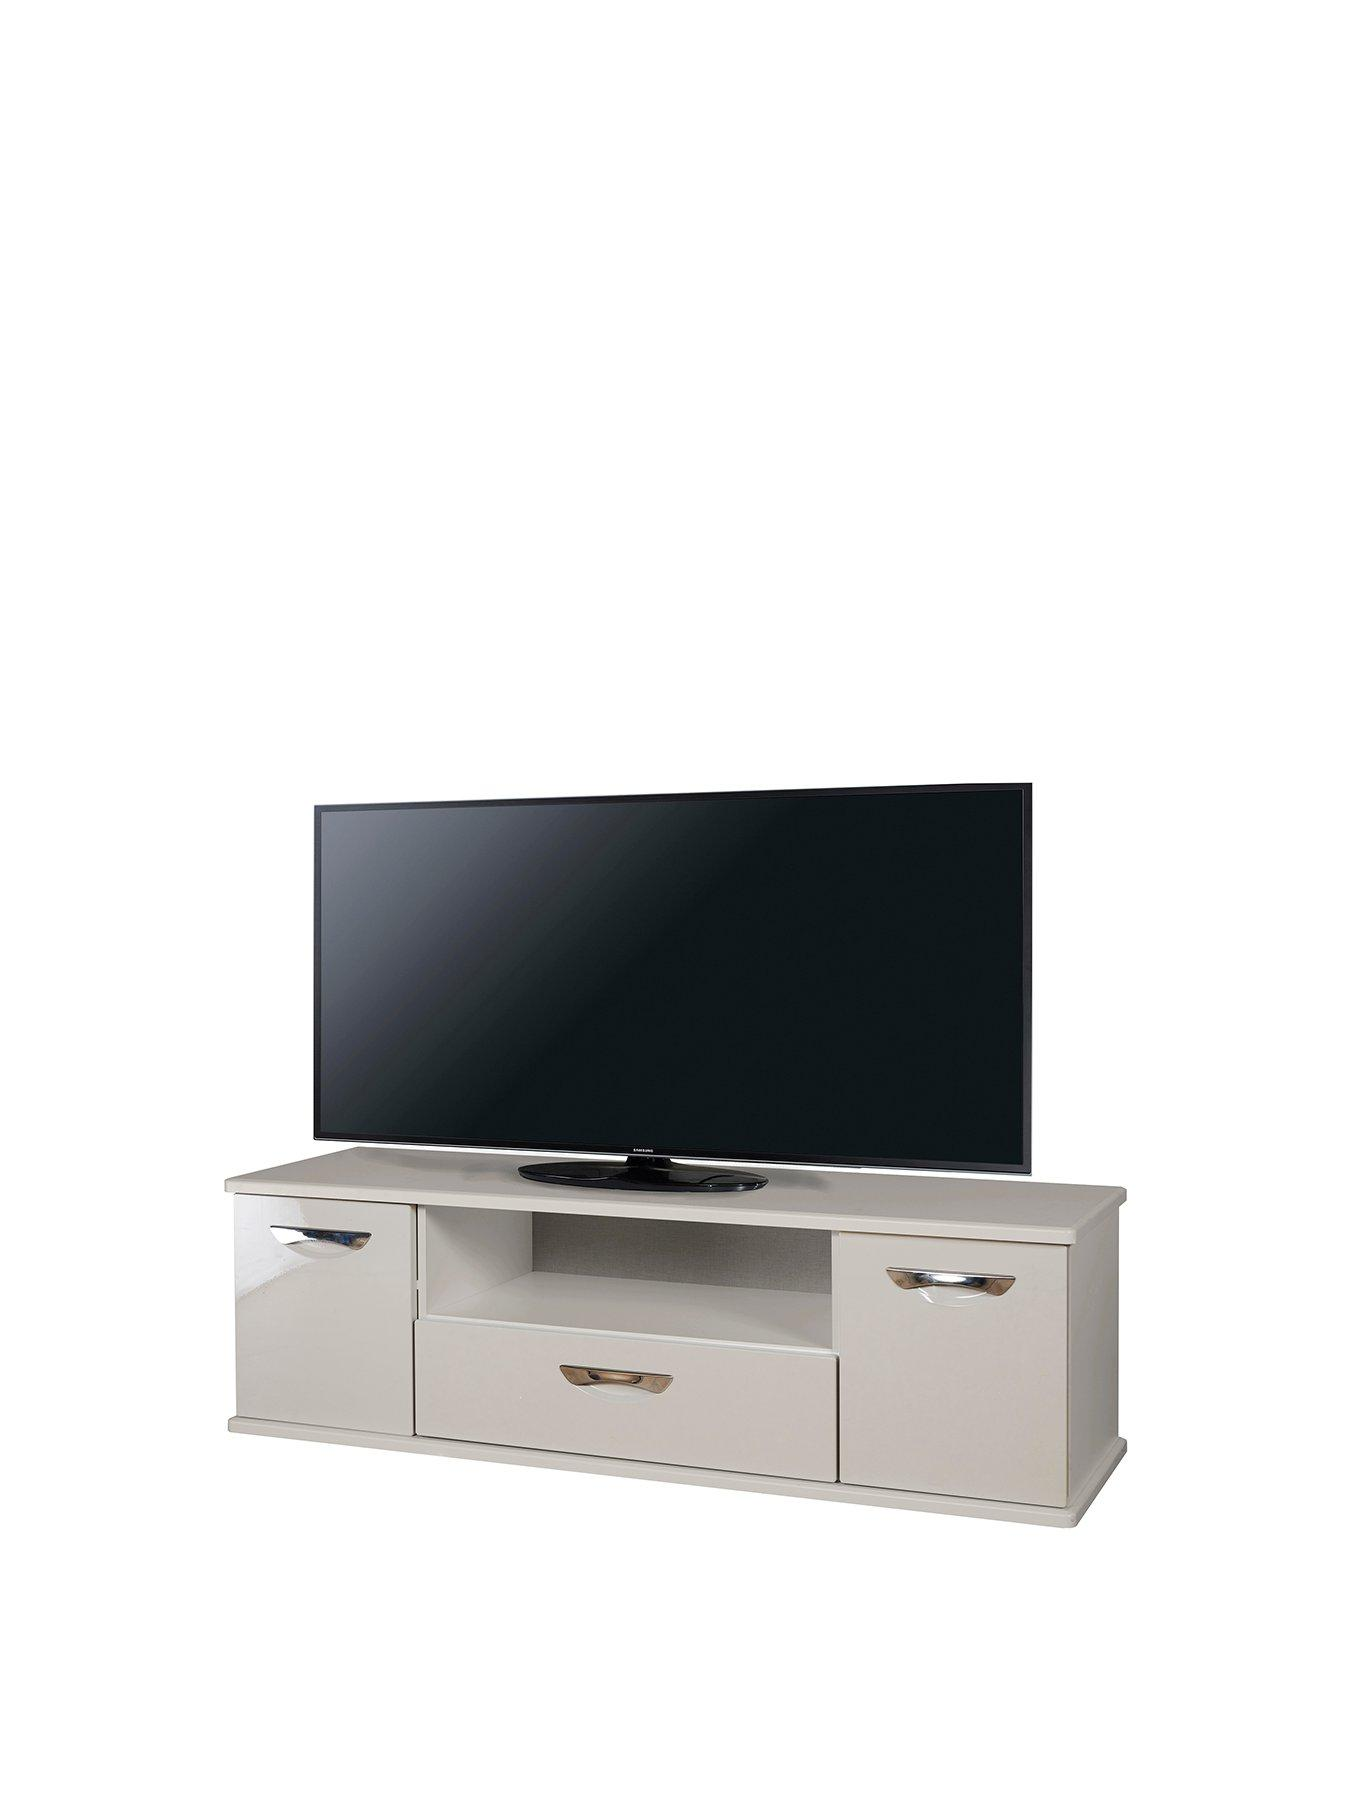 Grey 2 Drawer Home Source Corner Tv Stand Open Shelf Oak Top Metal Handles Runners Home Kitchen Living Room Furniture